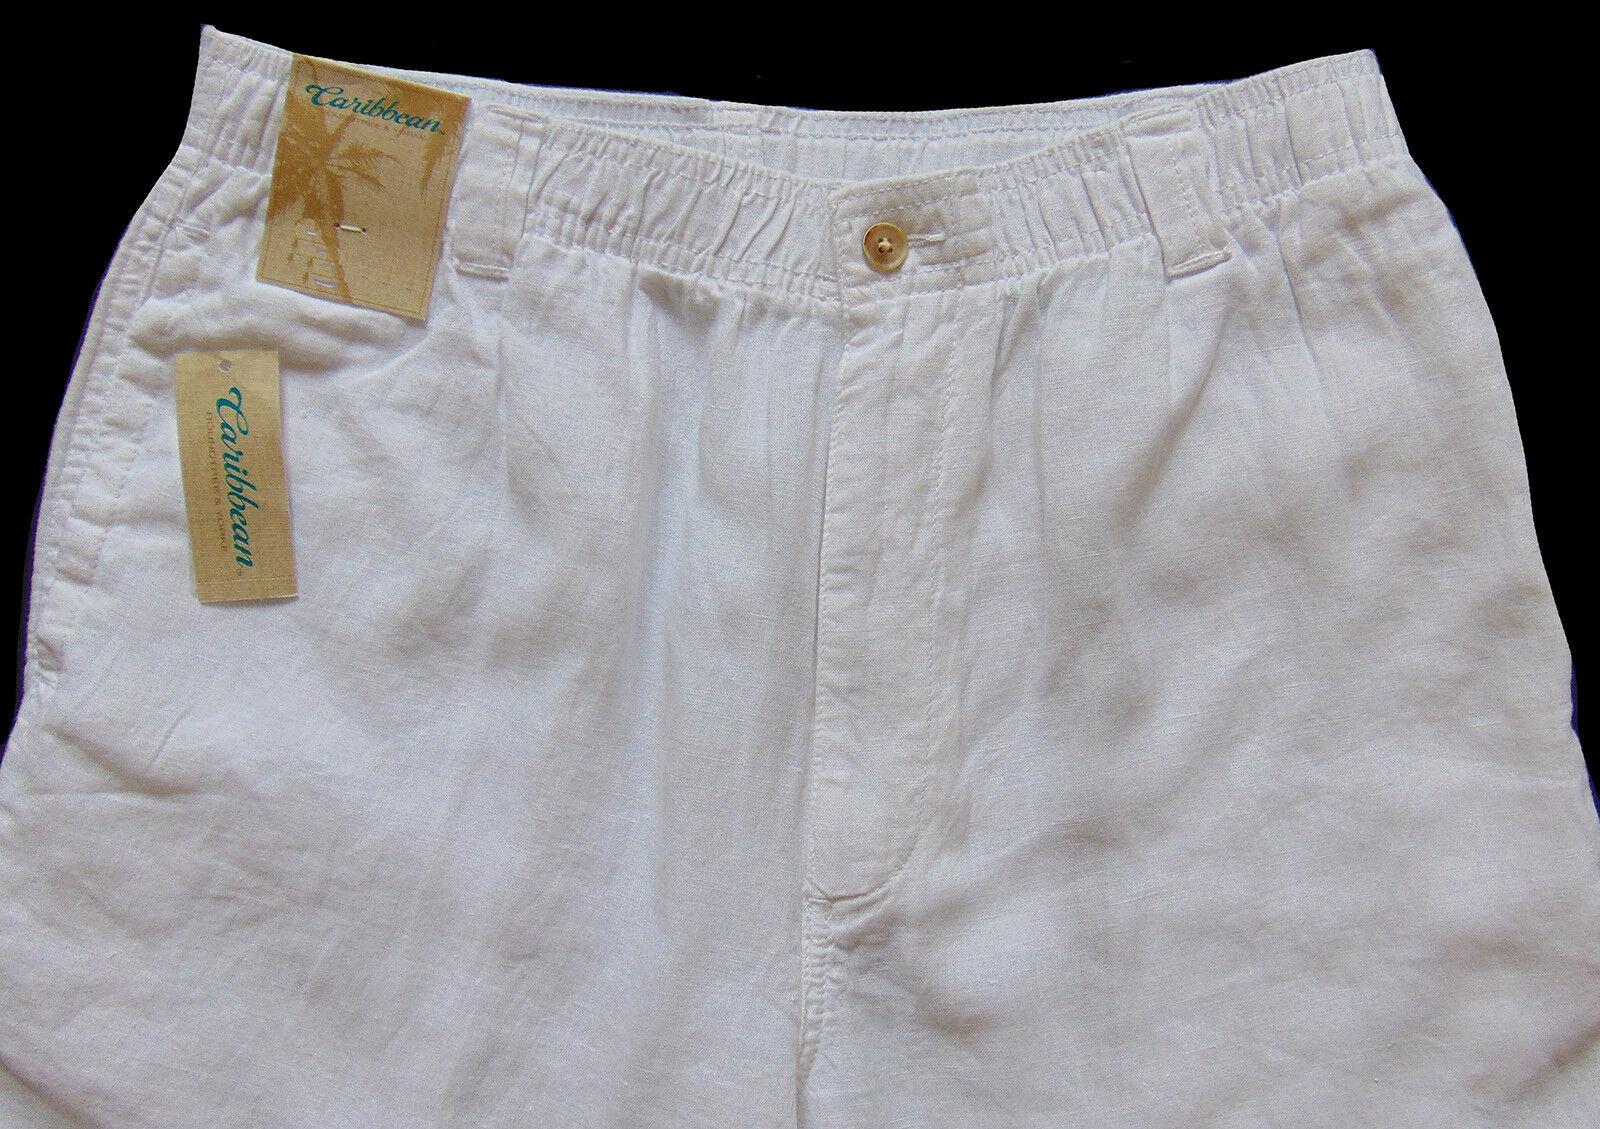 Men's CARIBBEAN White Pure LINEN Drawstring Pants 32x30 NWT Elastic Waist Nice